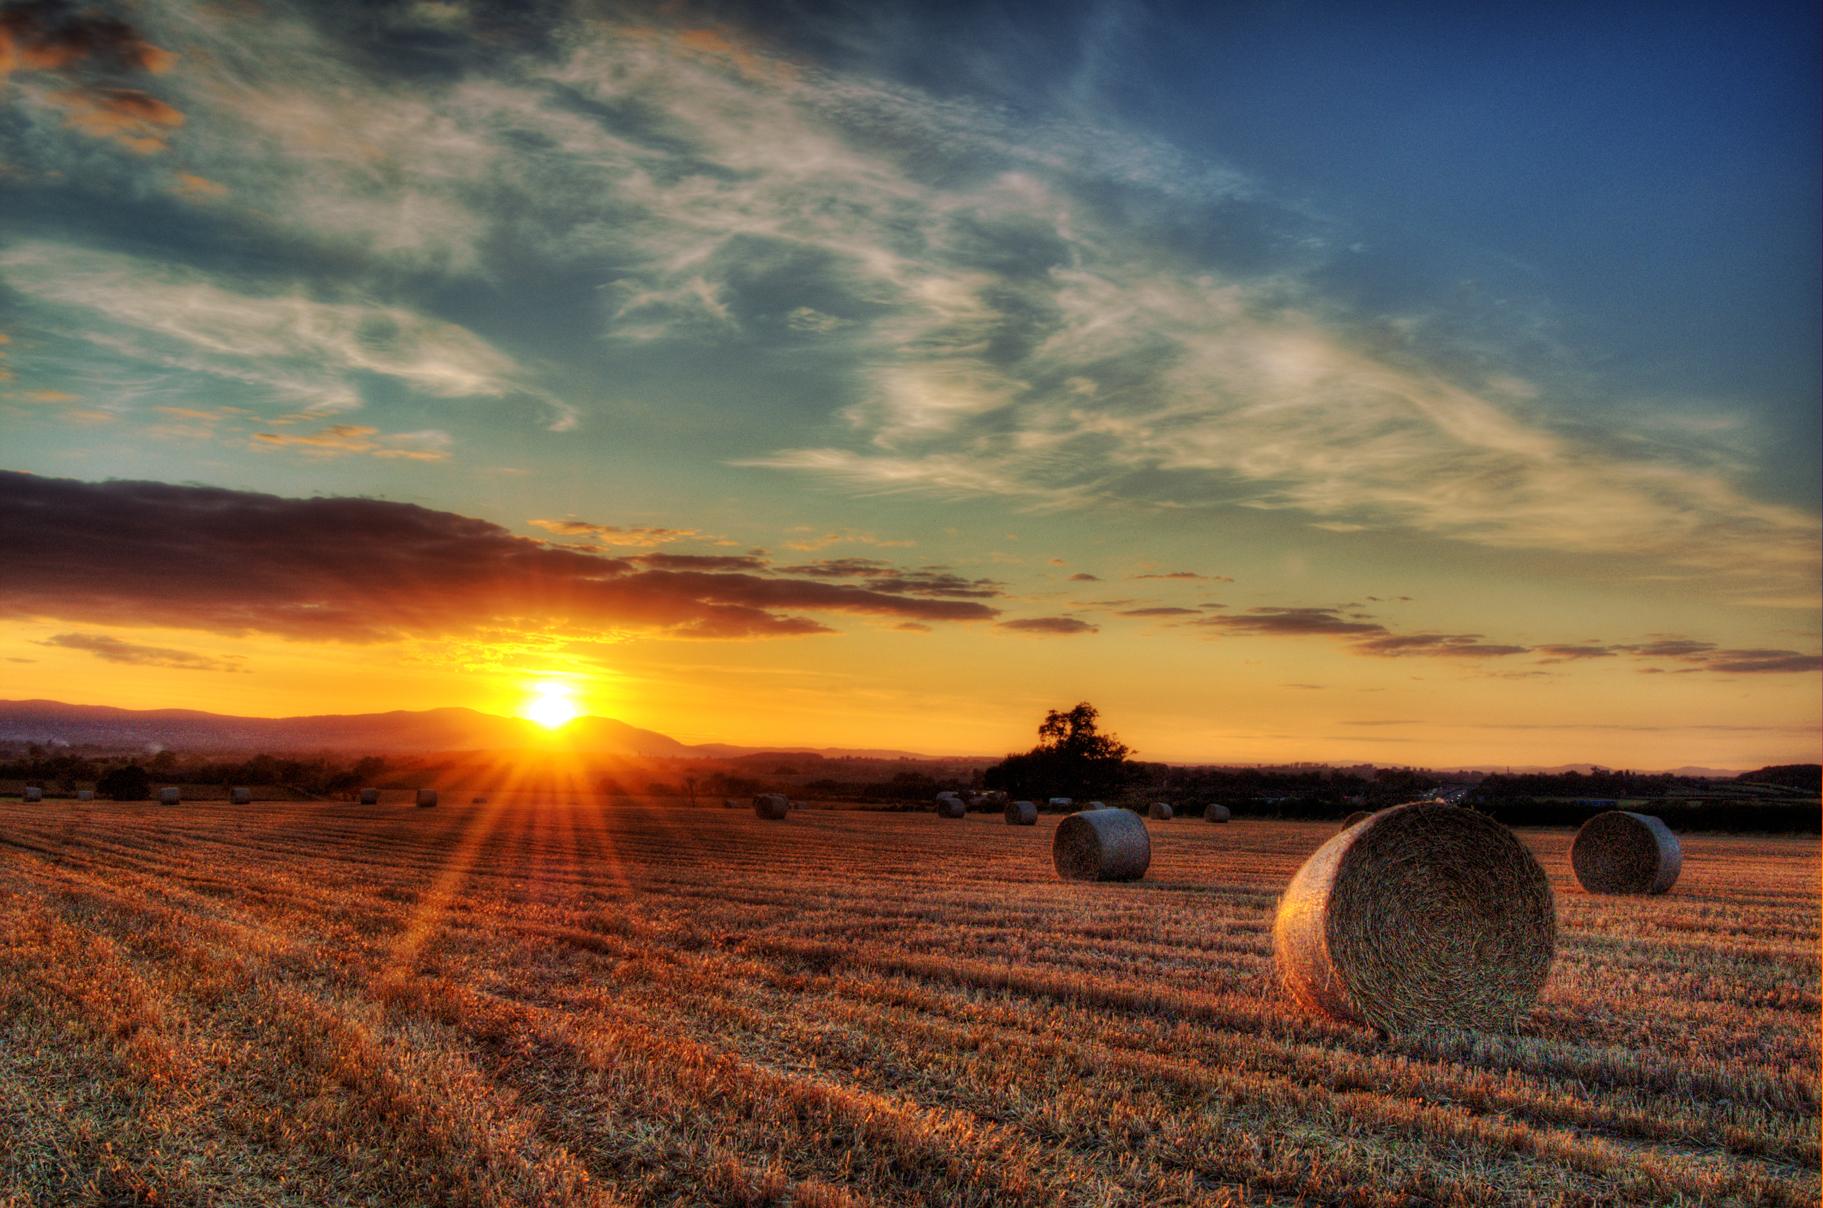 Sonnenuntergang im Heu